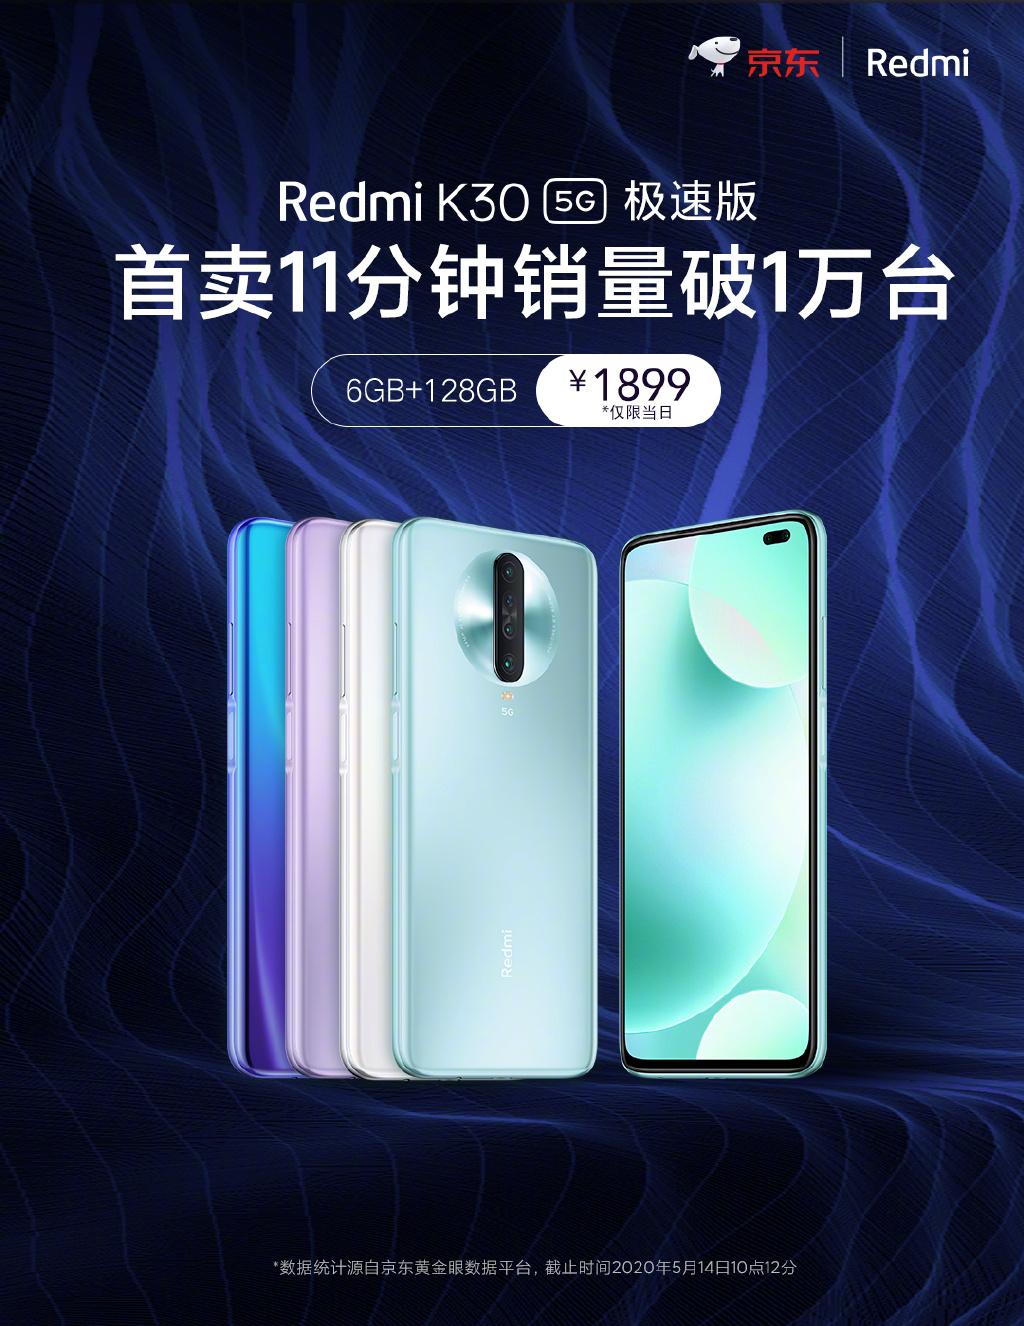 Redmi K30 5G极速版首销:11分钟破万台